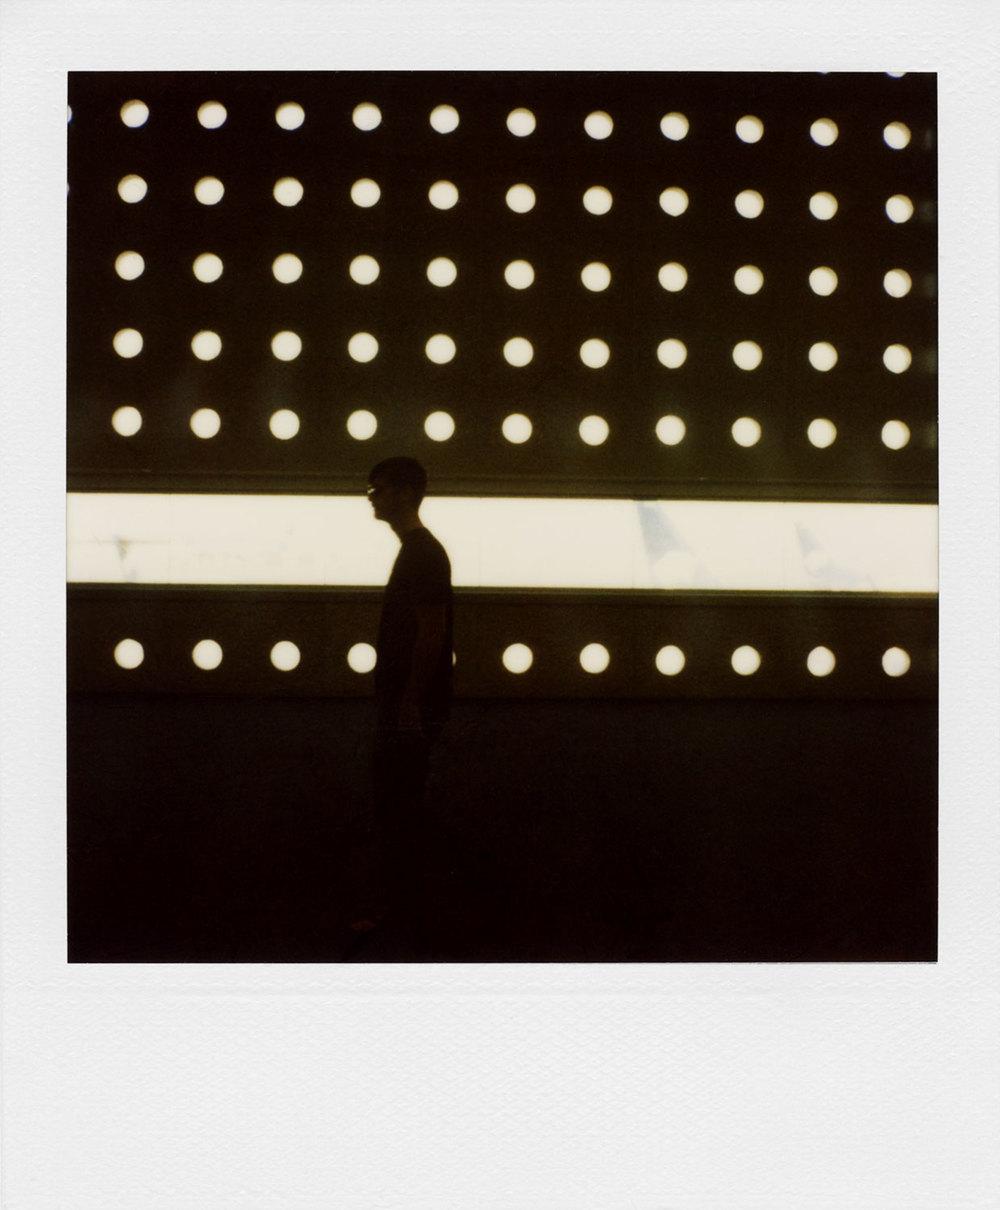 polaroid-49.jpg